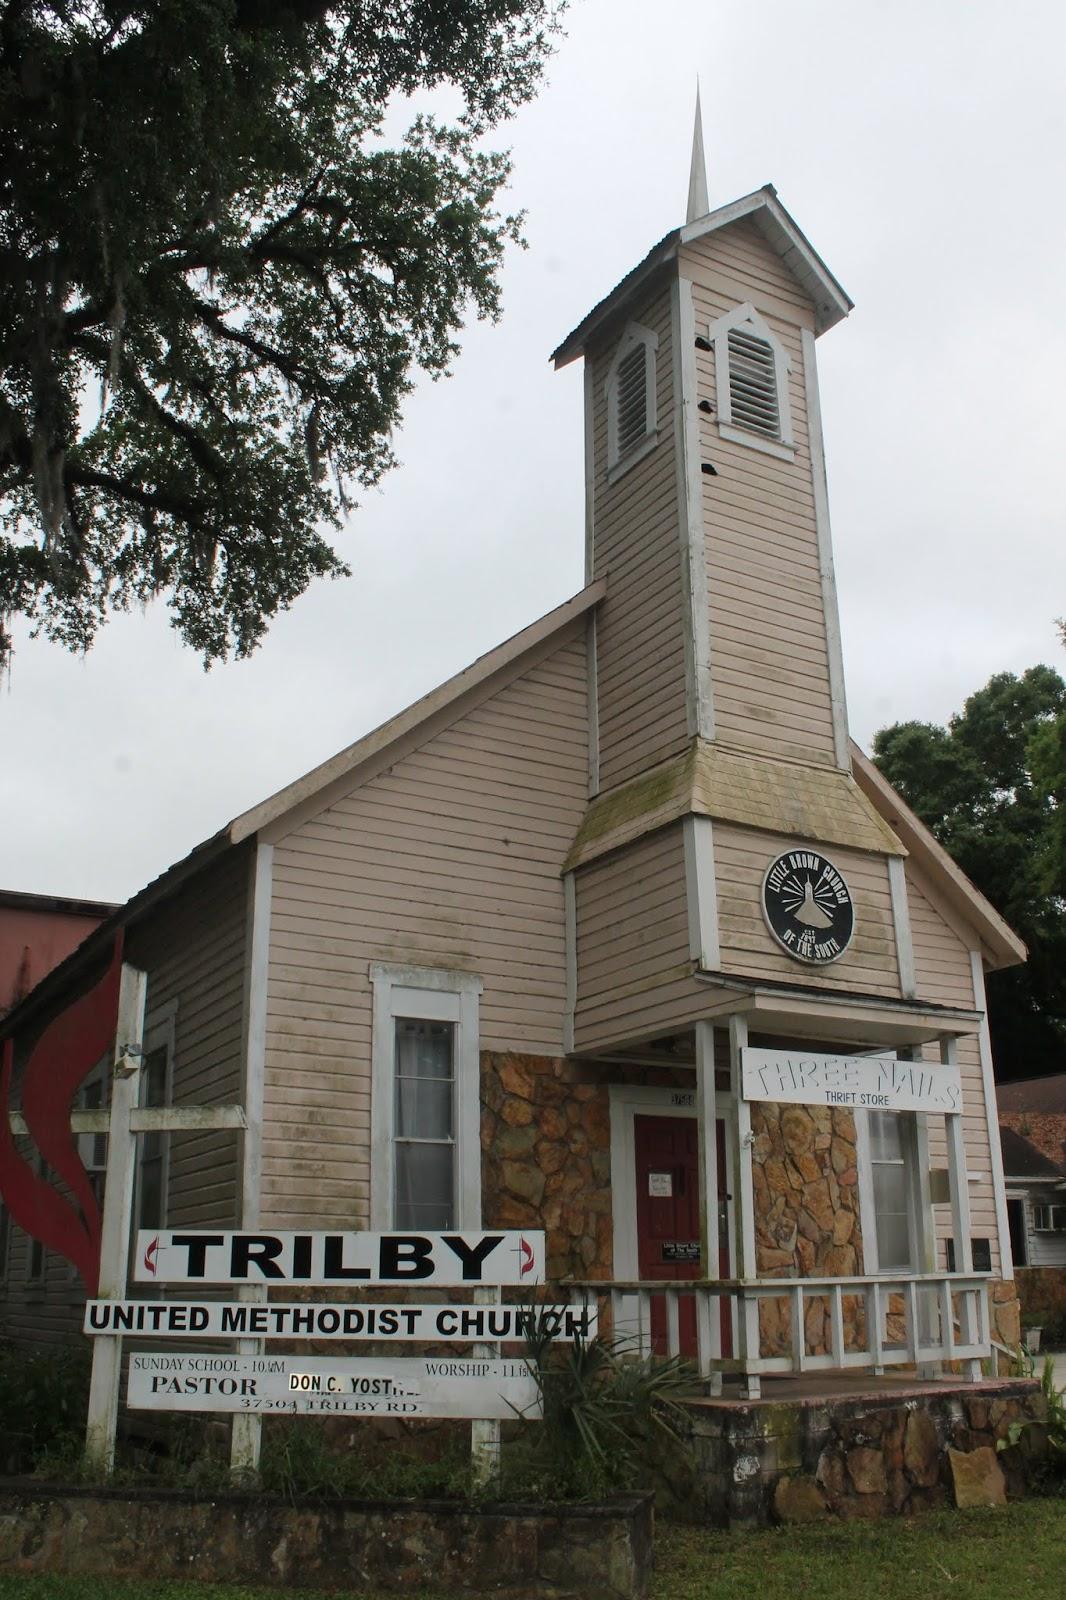 Iglesia en Trilby